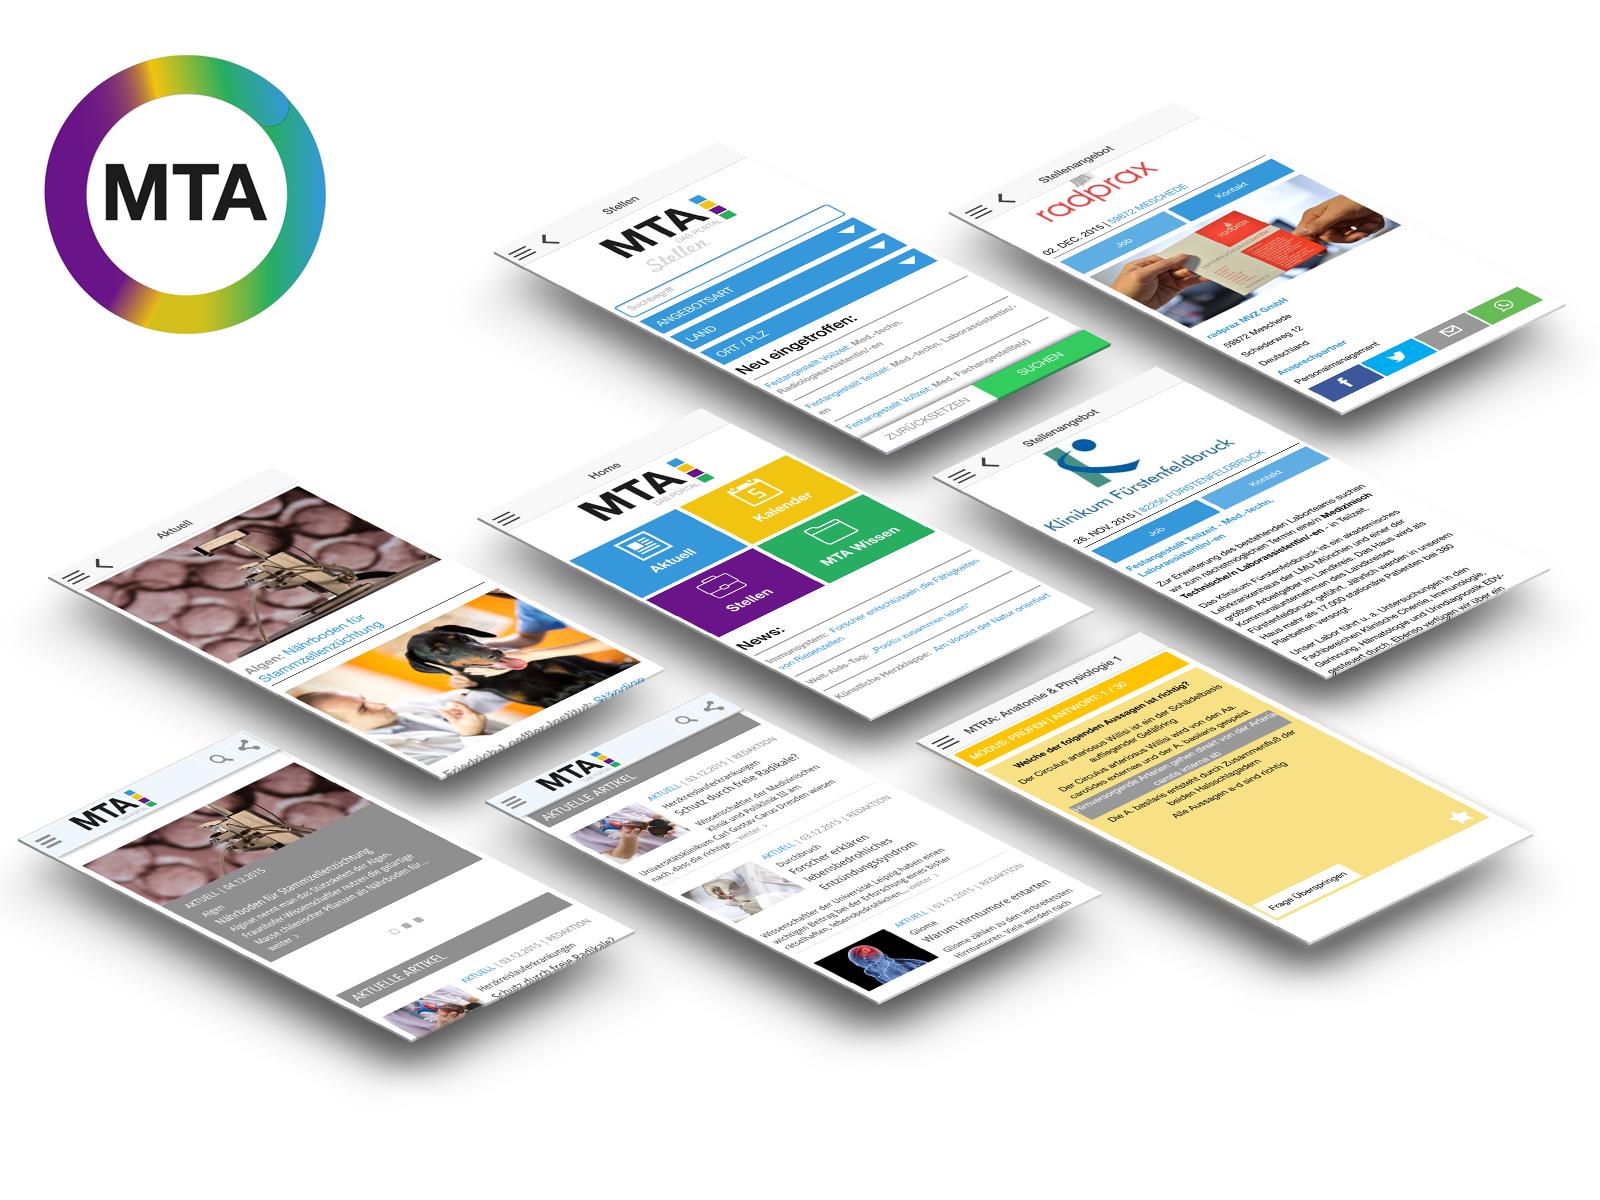 MTA-Portal App für iOS und Android